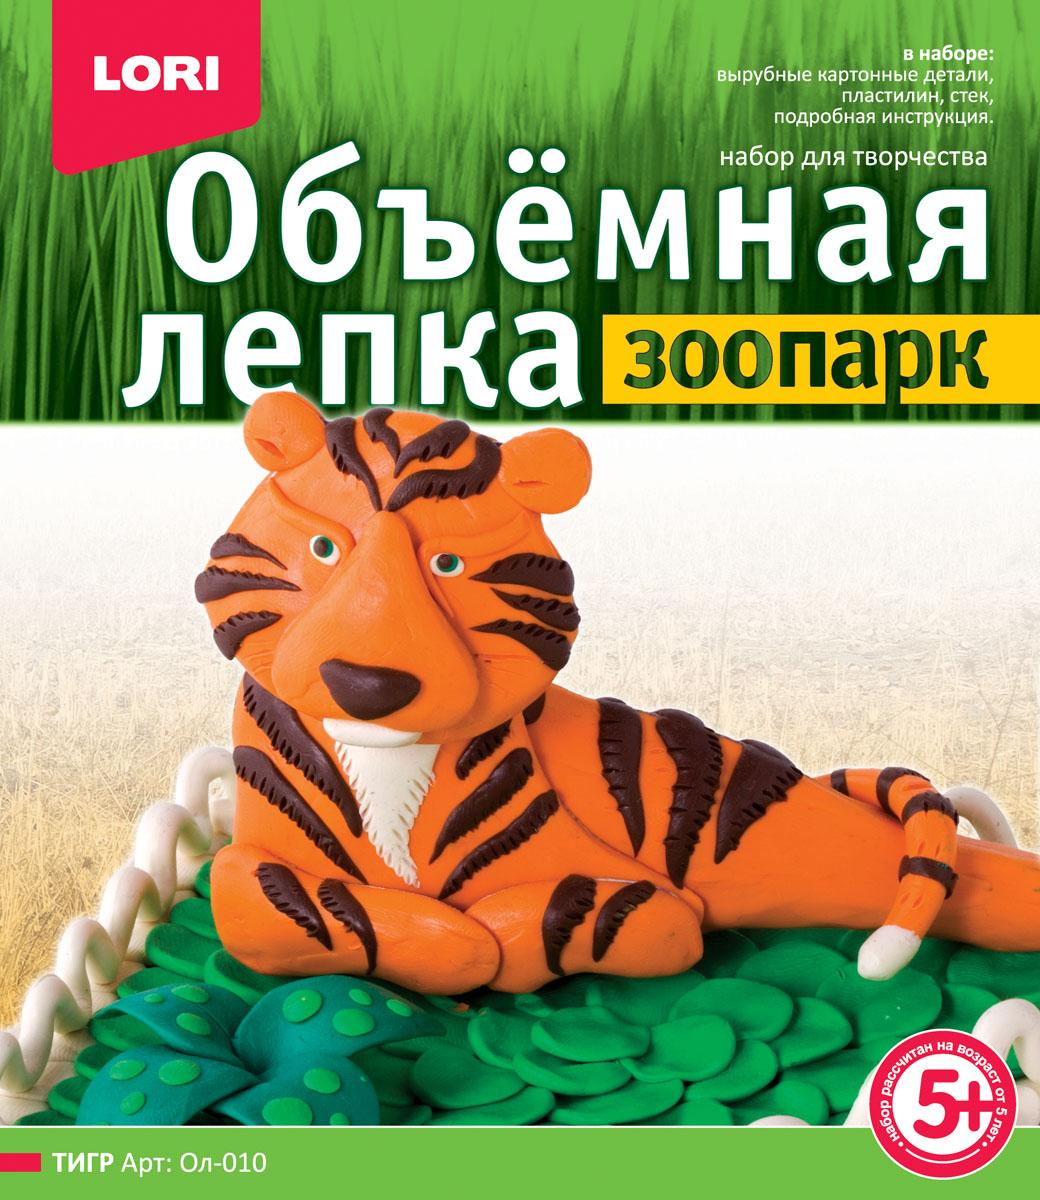 Lori Лепка объемная.Зоопарк